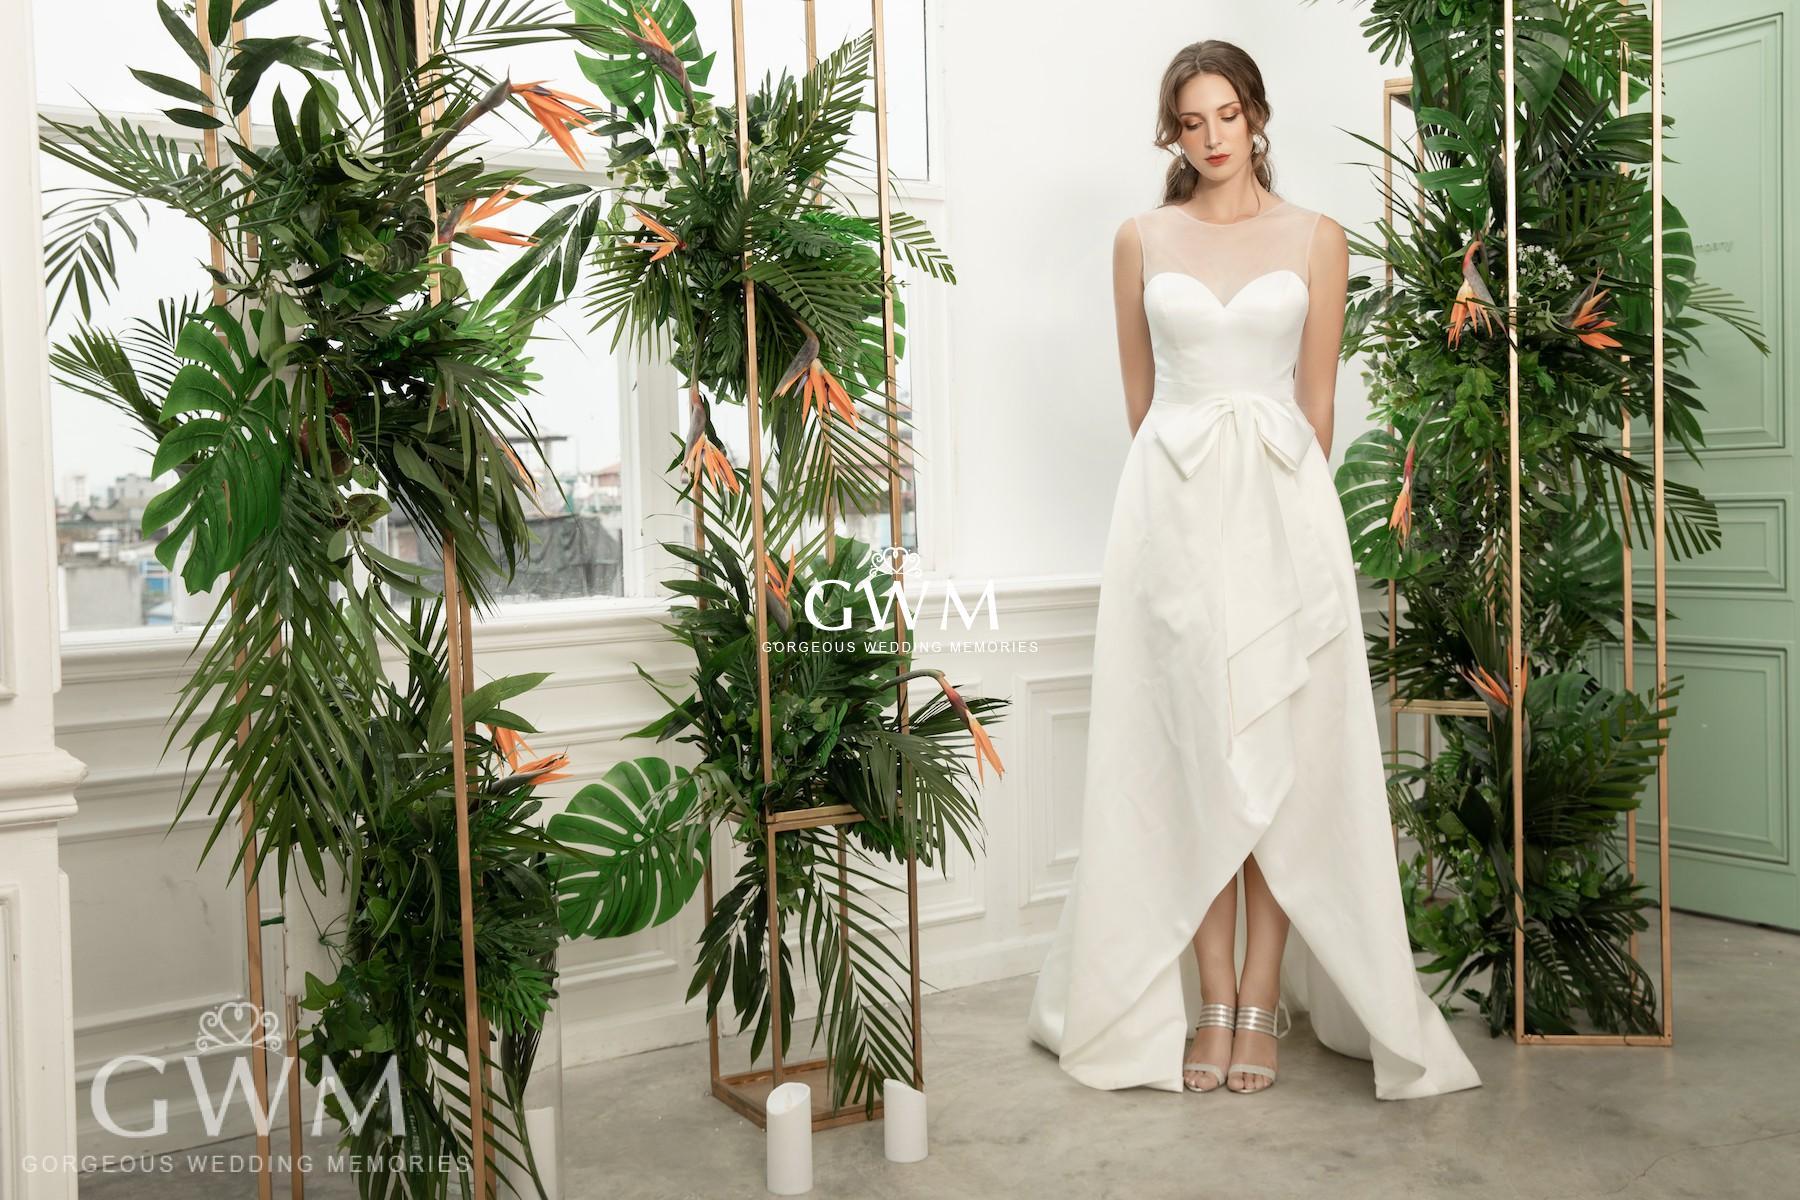 Boho bridal styles